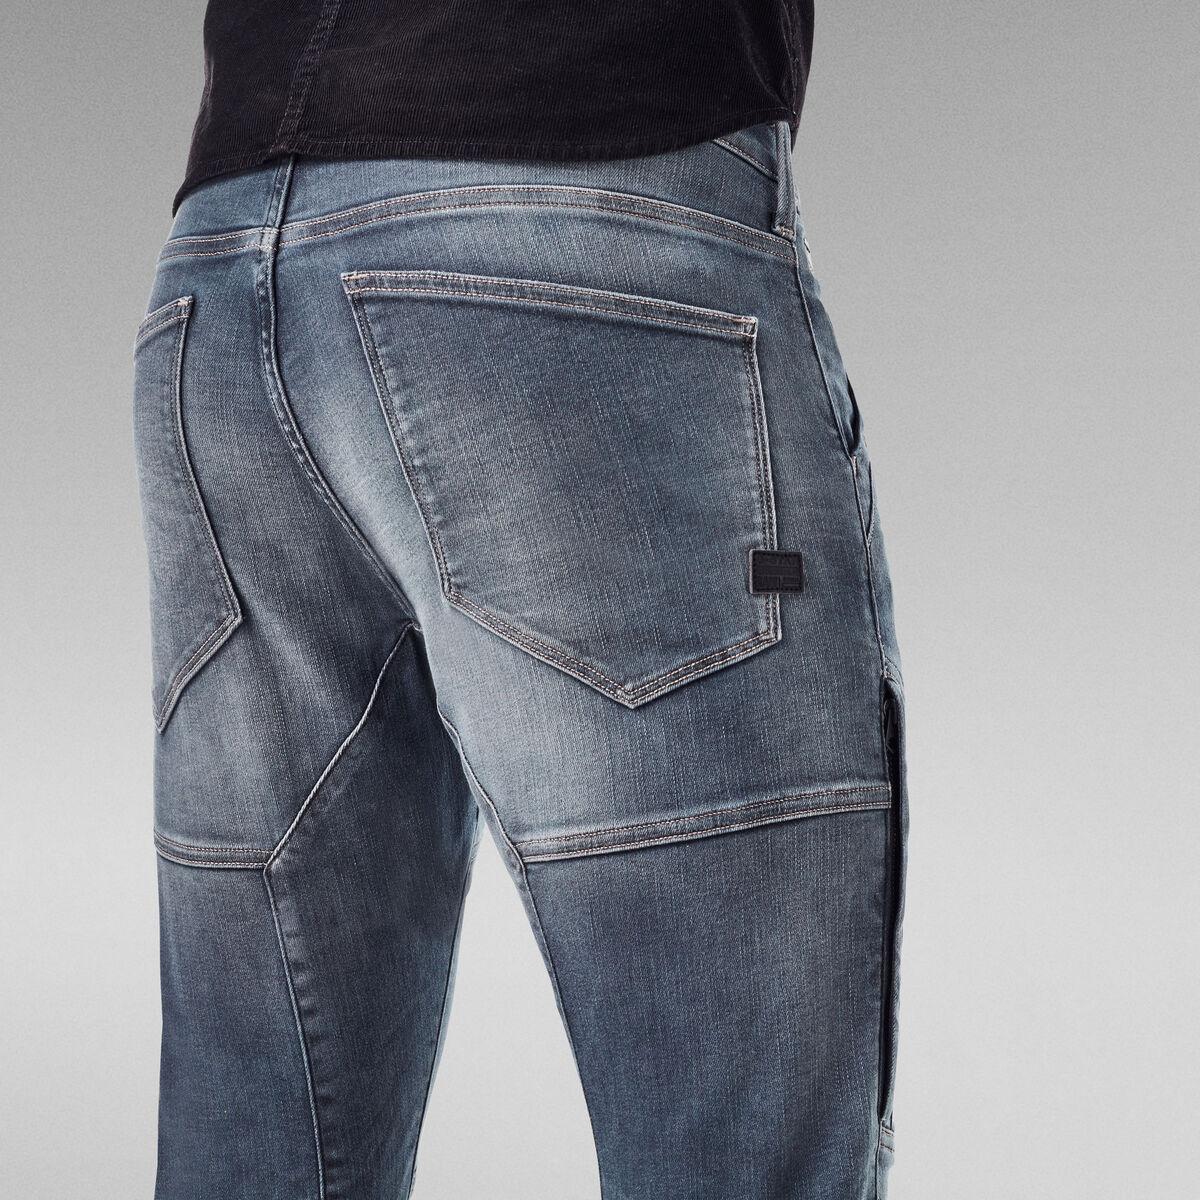 Bild 3 von Rackam 3D Skinny Jeans